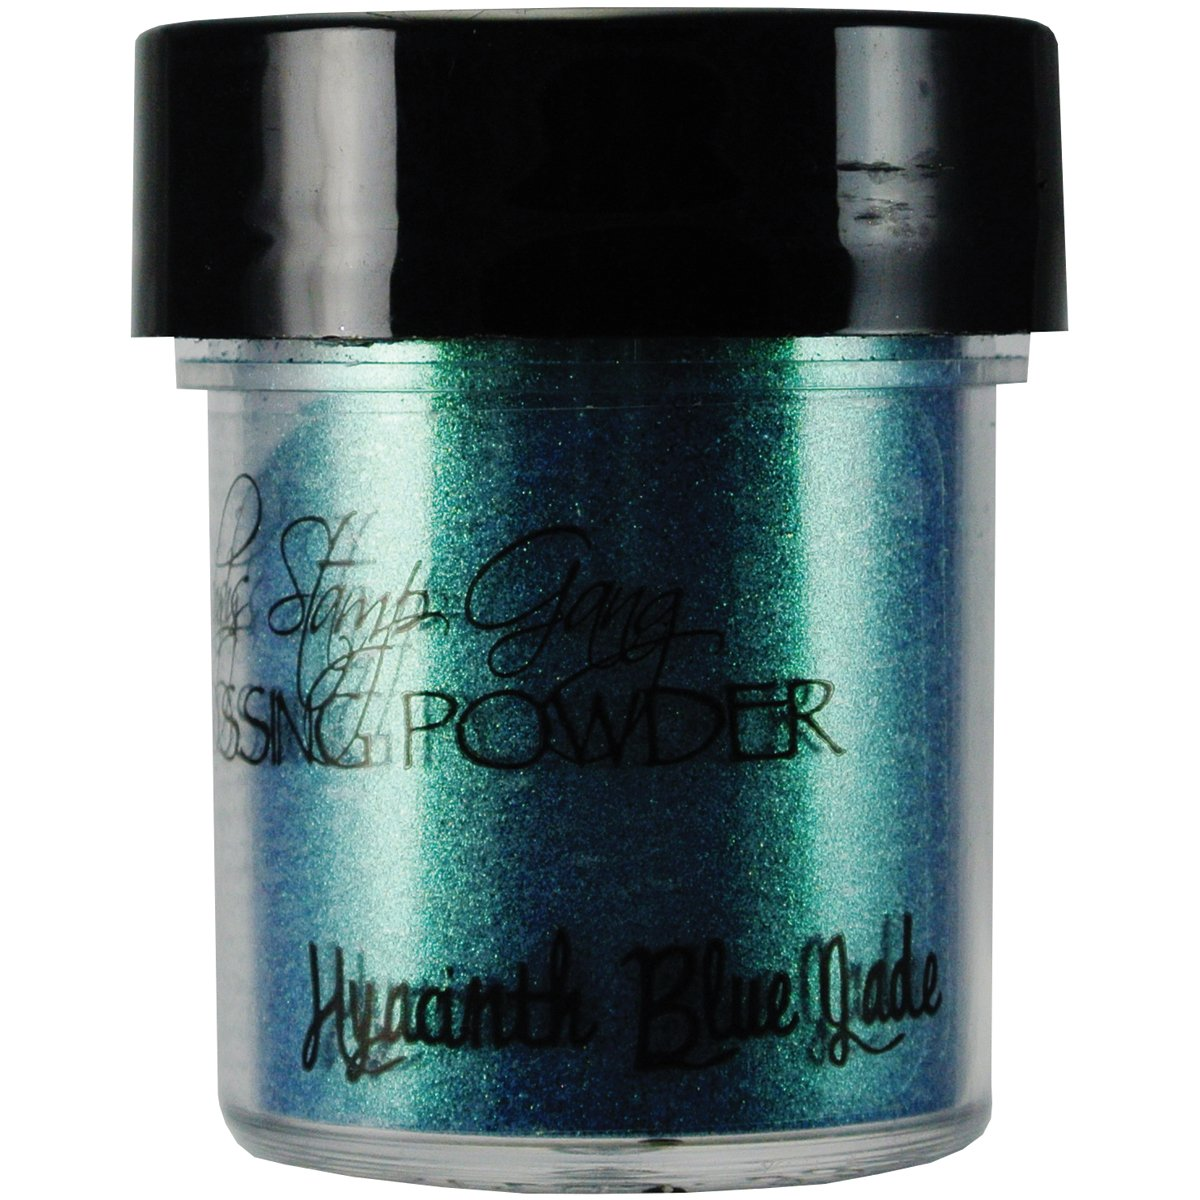 Lindy timbro Gang 2-Tone goffratura polvere .5Oz vasetti-giacinto blu verde   Comentarios de clientes y más información